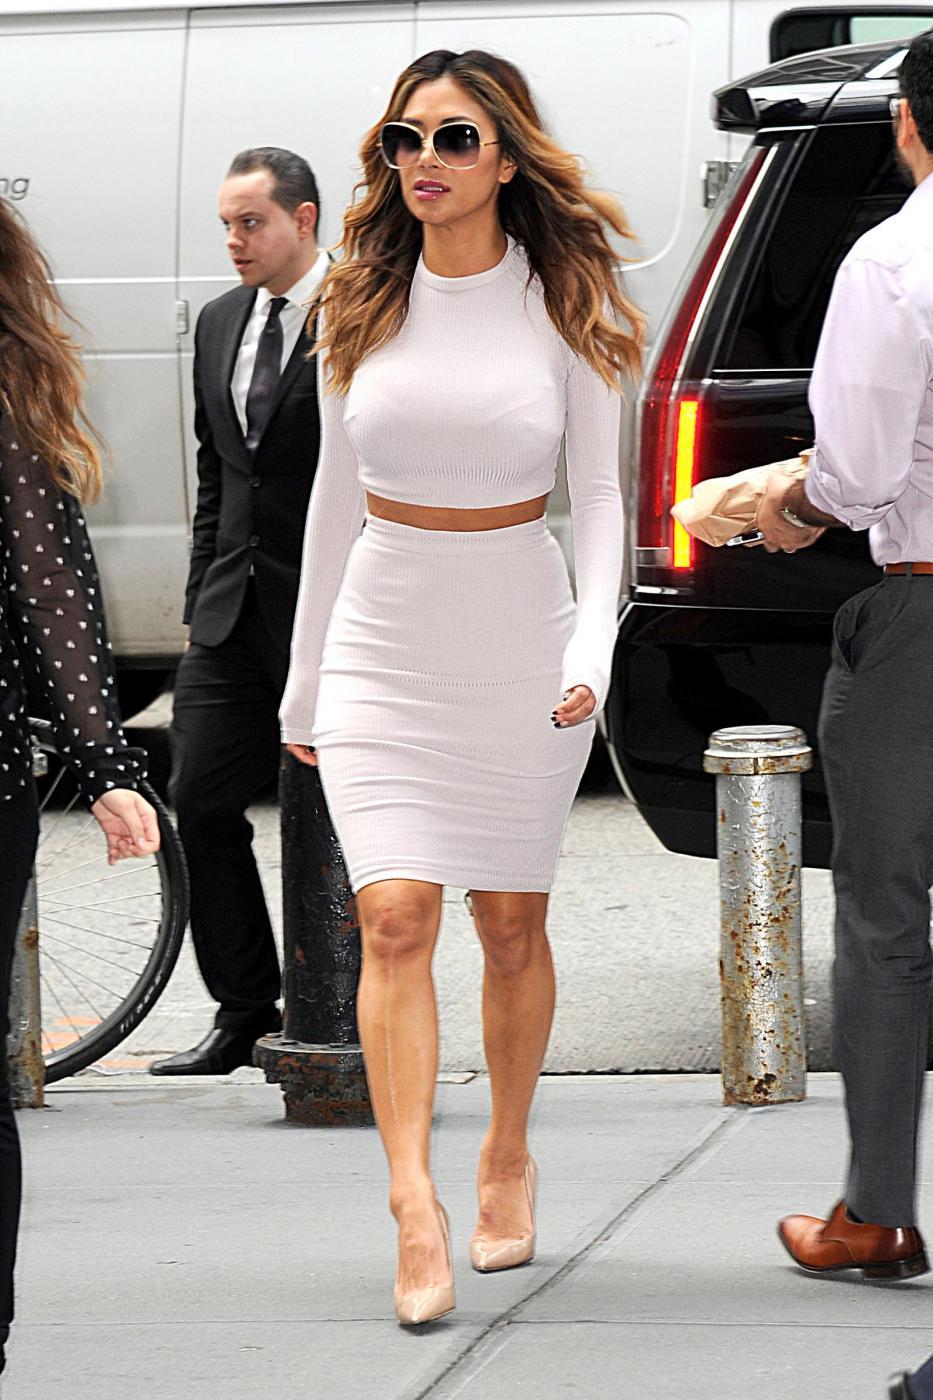 Nicole Scherzinger sempre più curvy e...bionda. Abiti super aderenti a New York FOTO 7